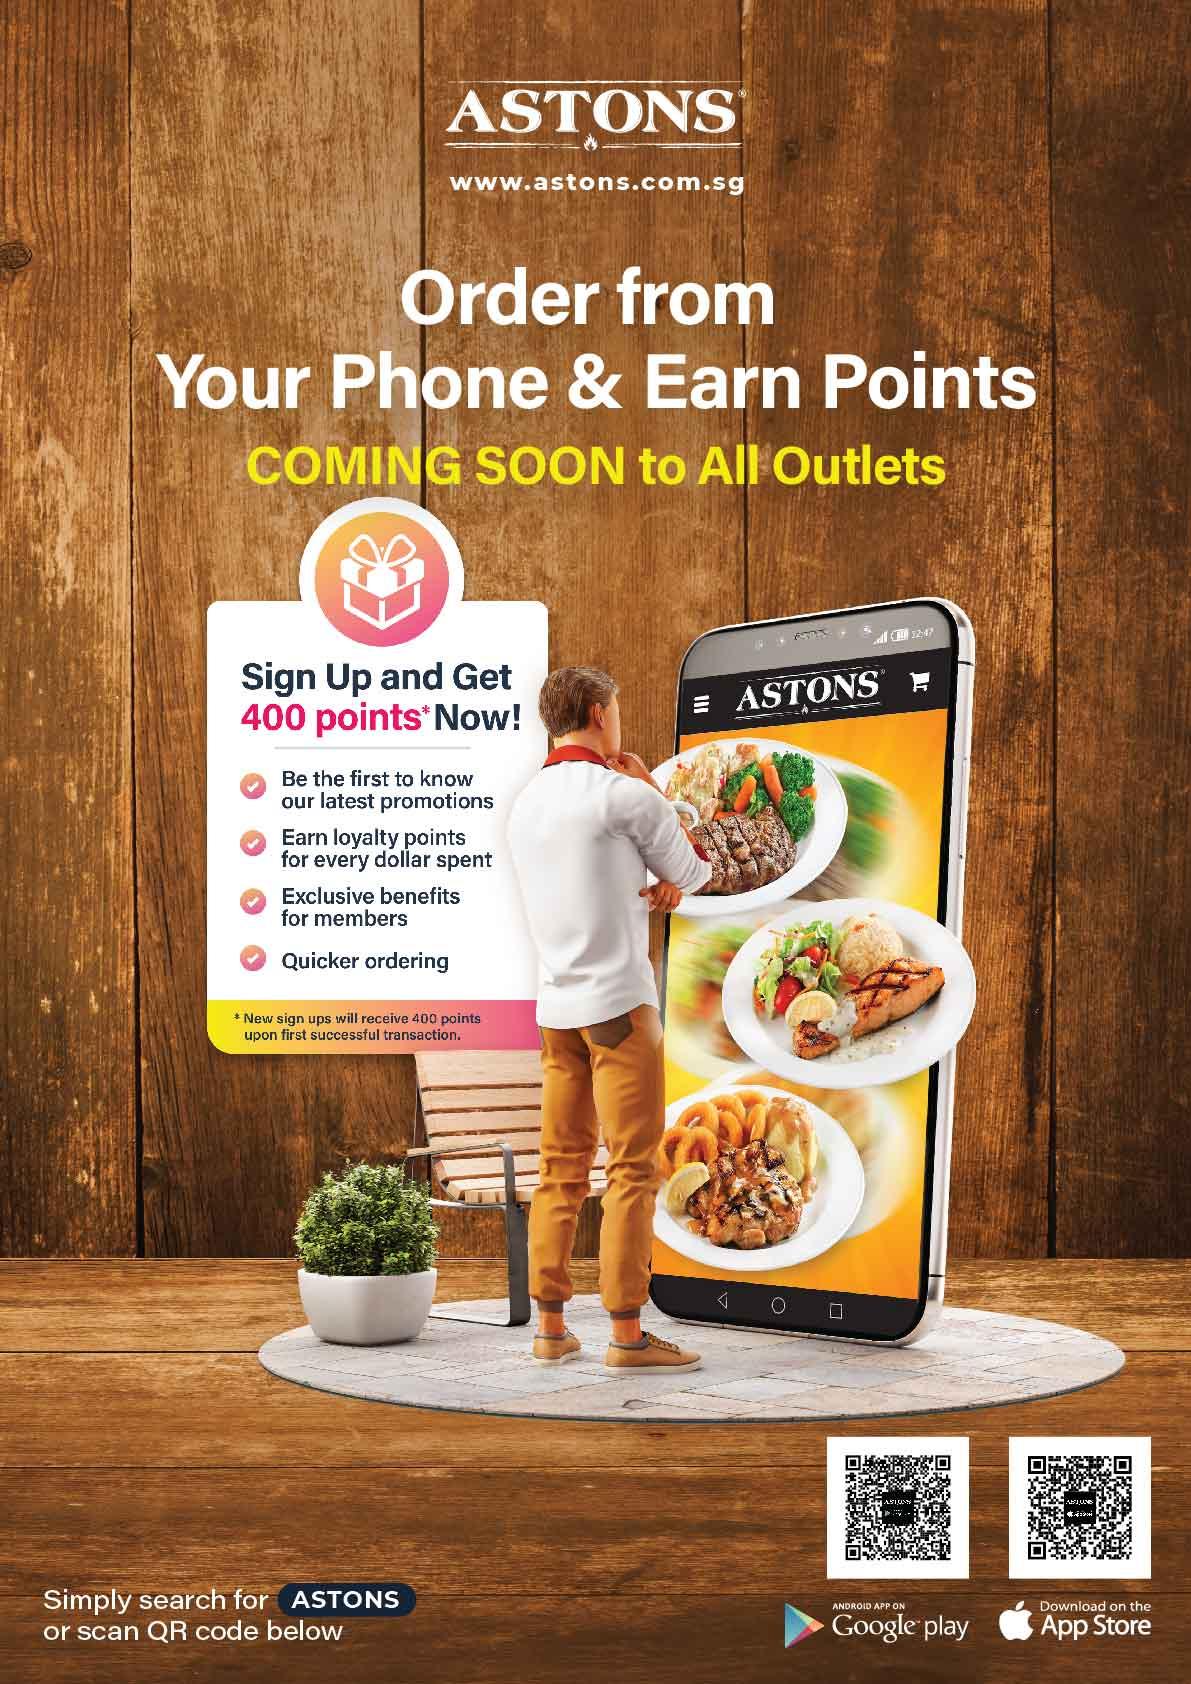 Astons_Specialities - OrderingApp